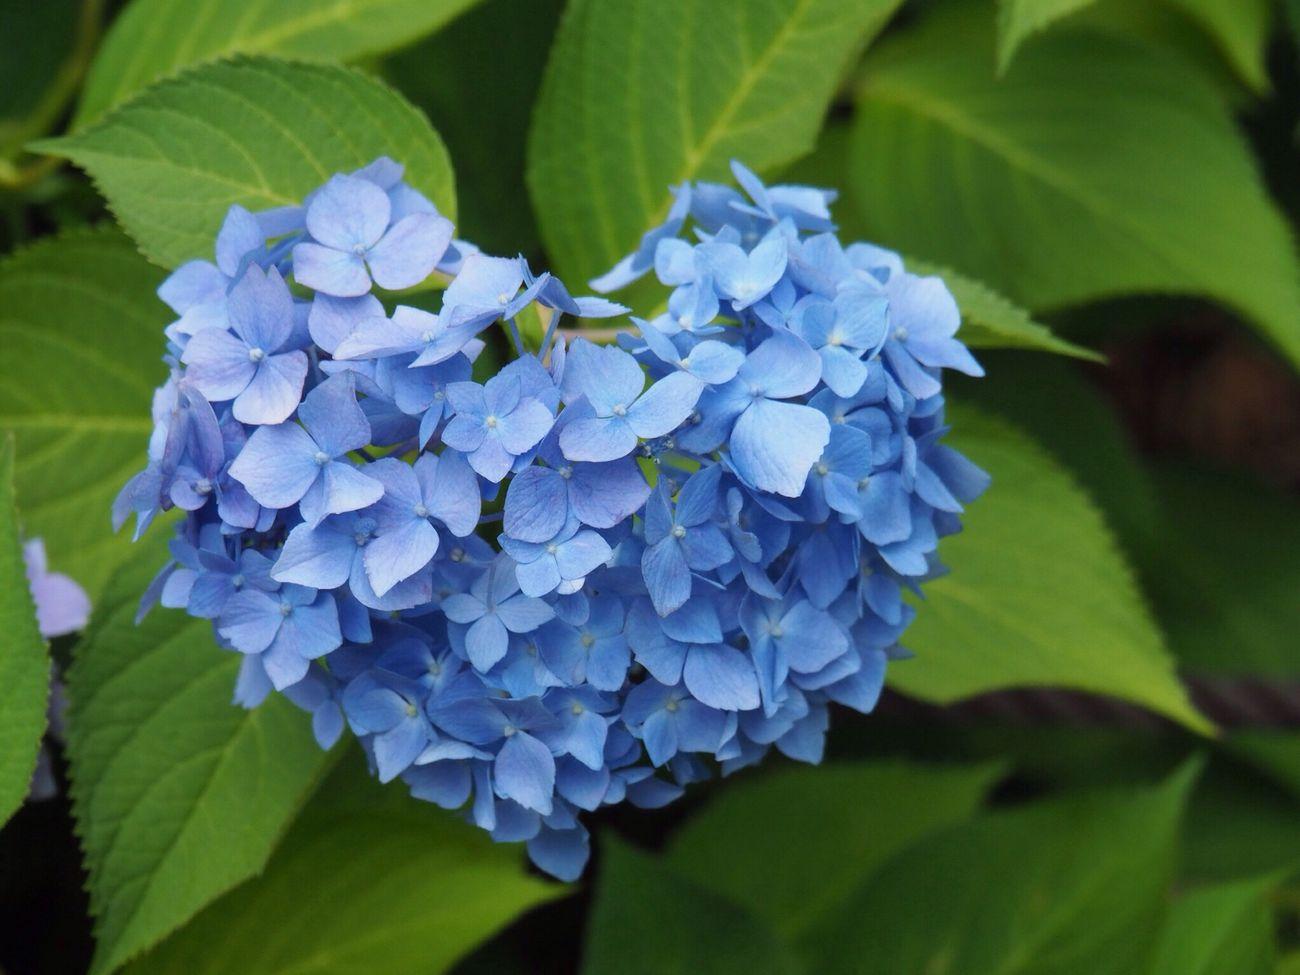 Kyoto Japan Uji Mimurotoji Temple Hydrangea Blue Purple Flower Beauty In Nature Nature Close-up Heart Olympus PEN-F 京都 日本 宇治 三室戸寺 紫陽花 はーと